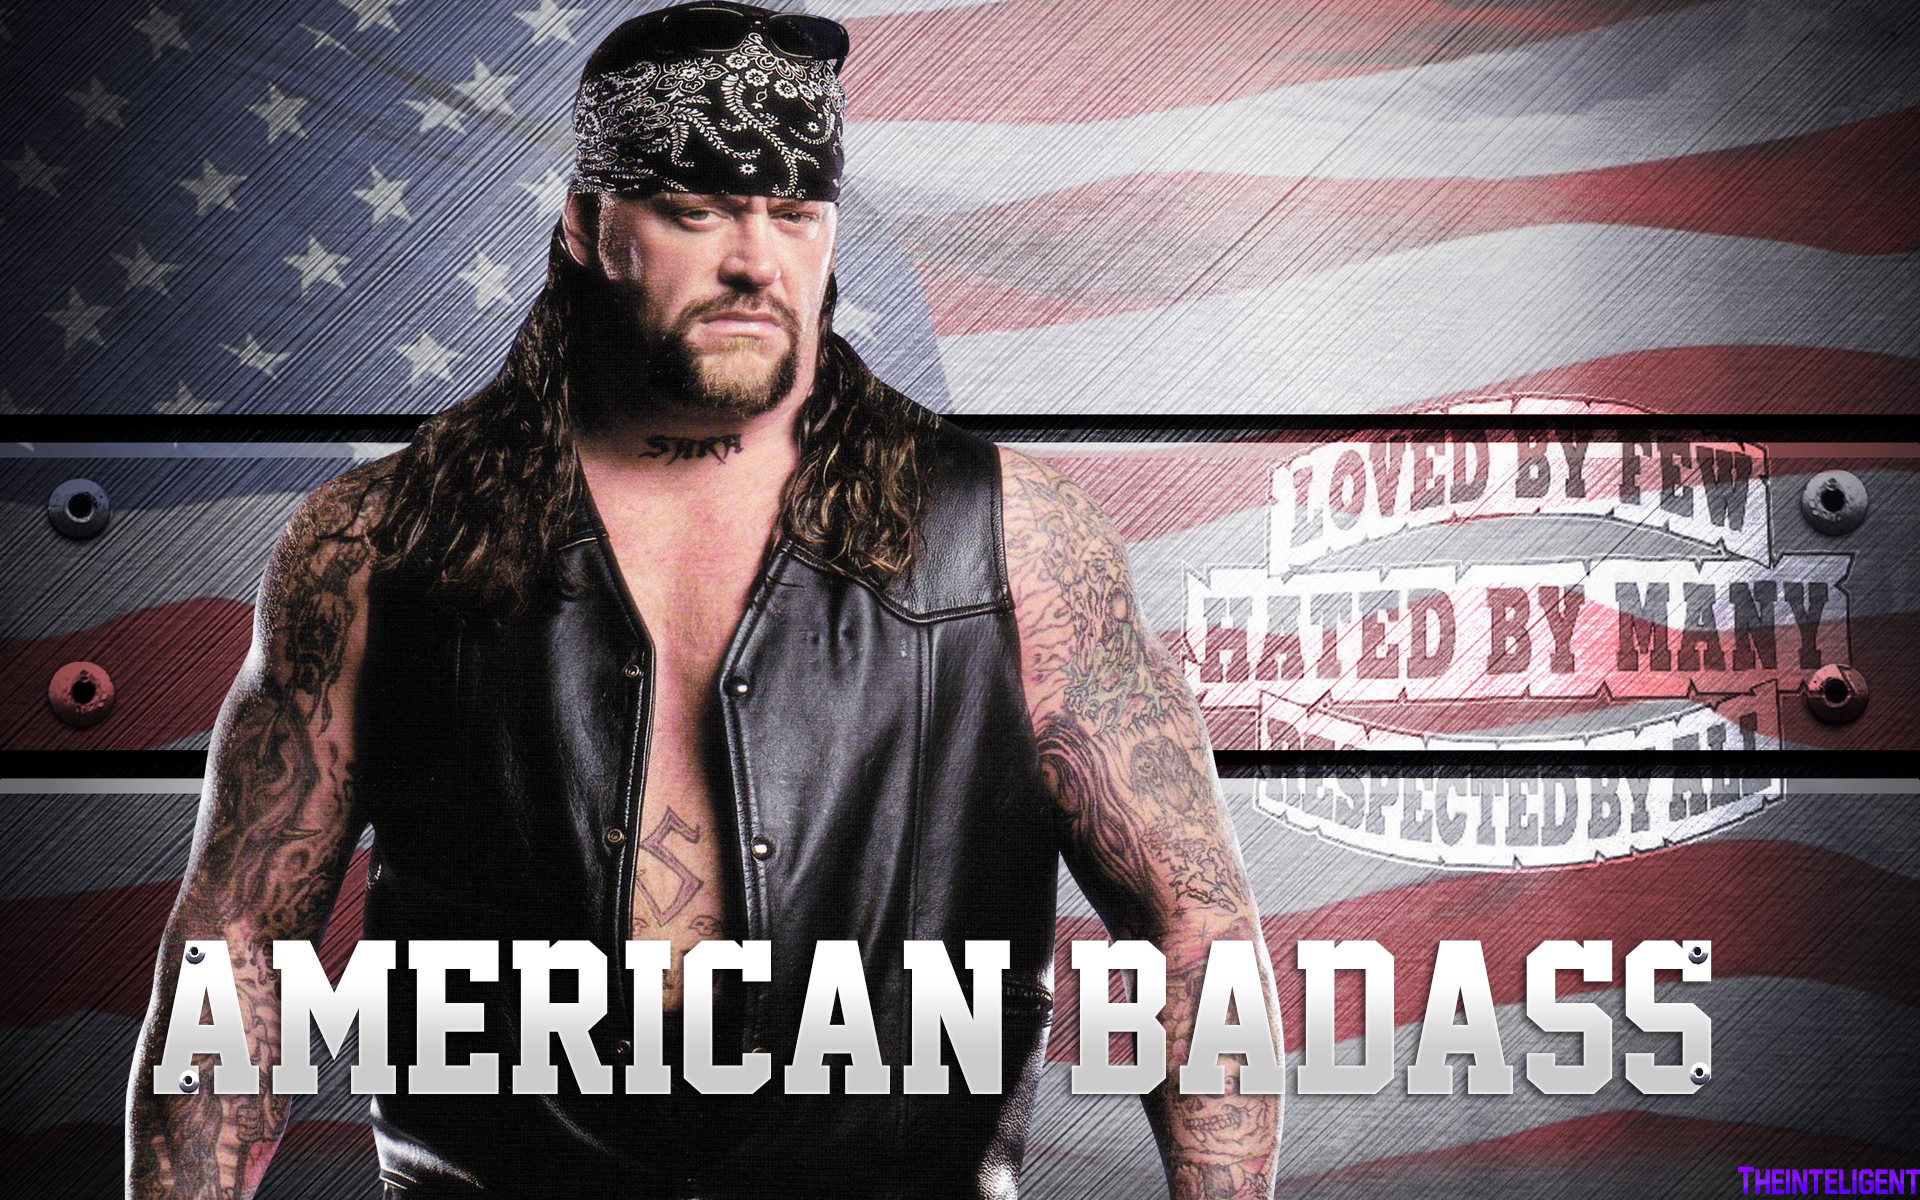 The Undertaker American Badass Wallpaper HD By Theinteligent